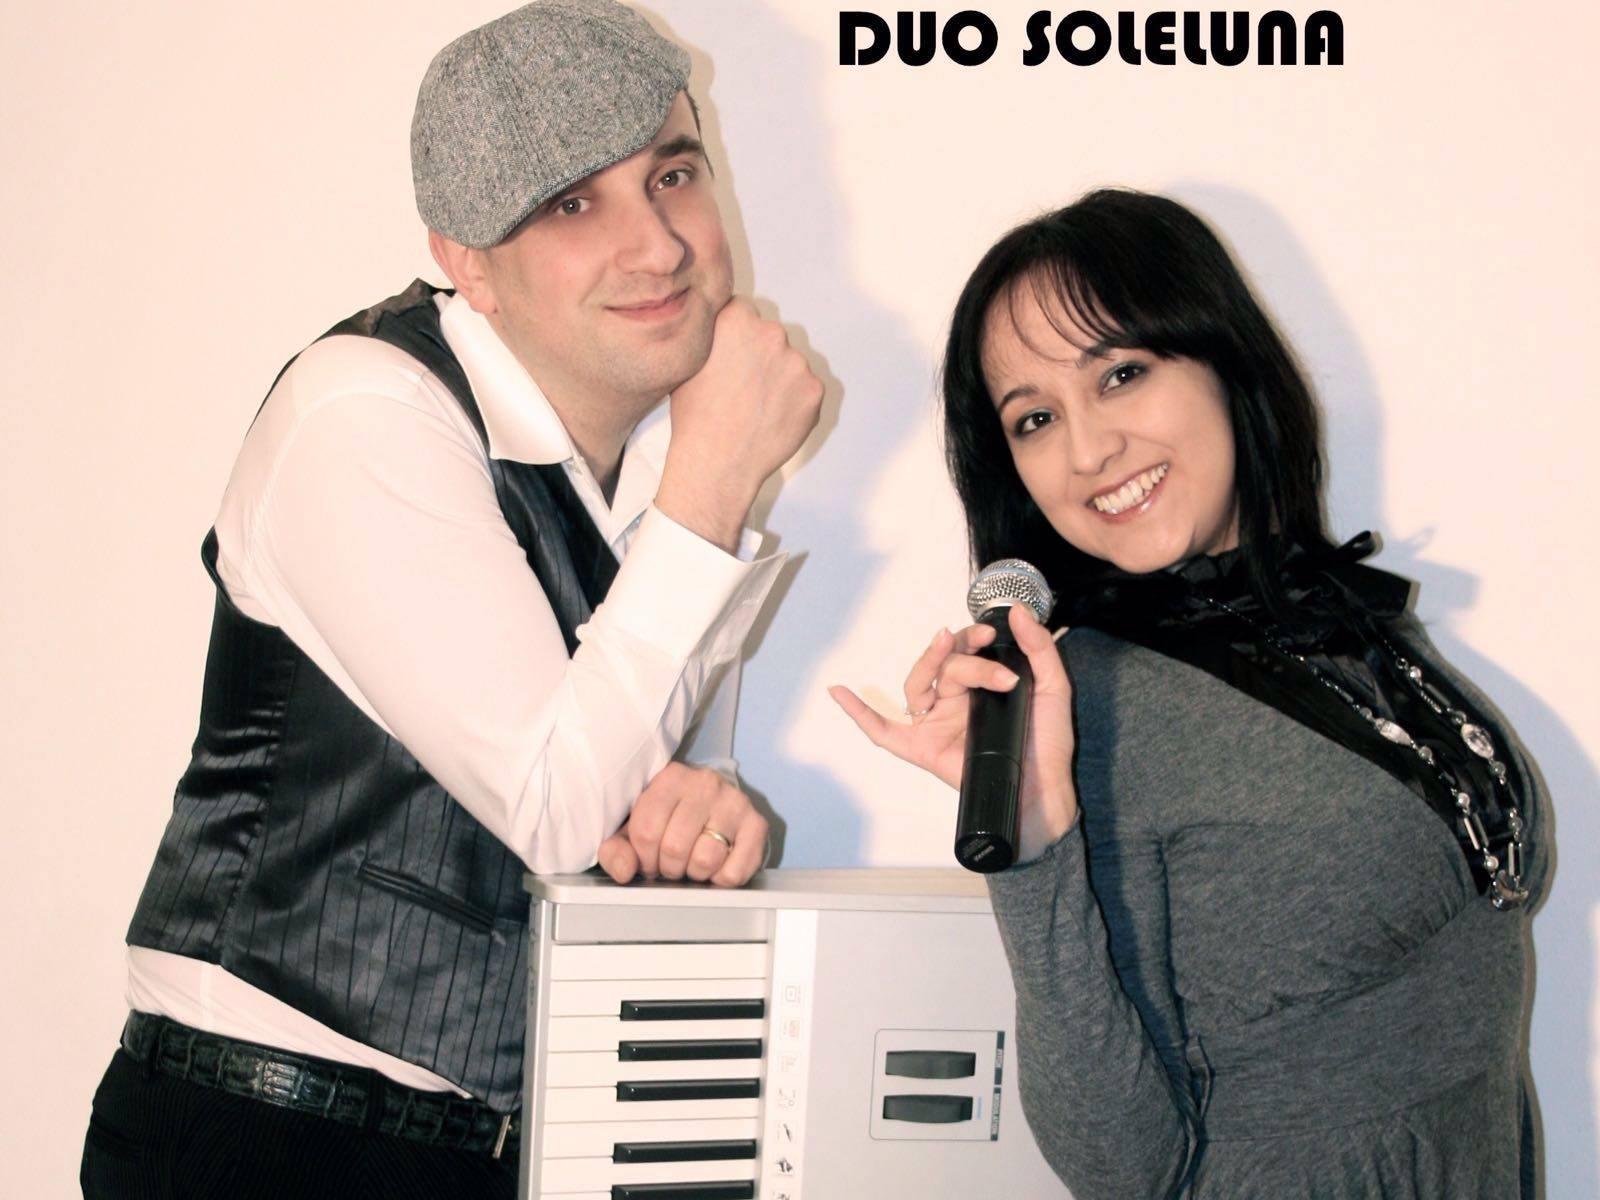 Duo SoleLuna